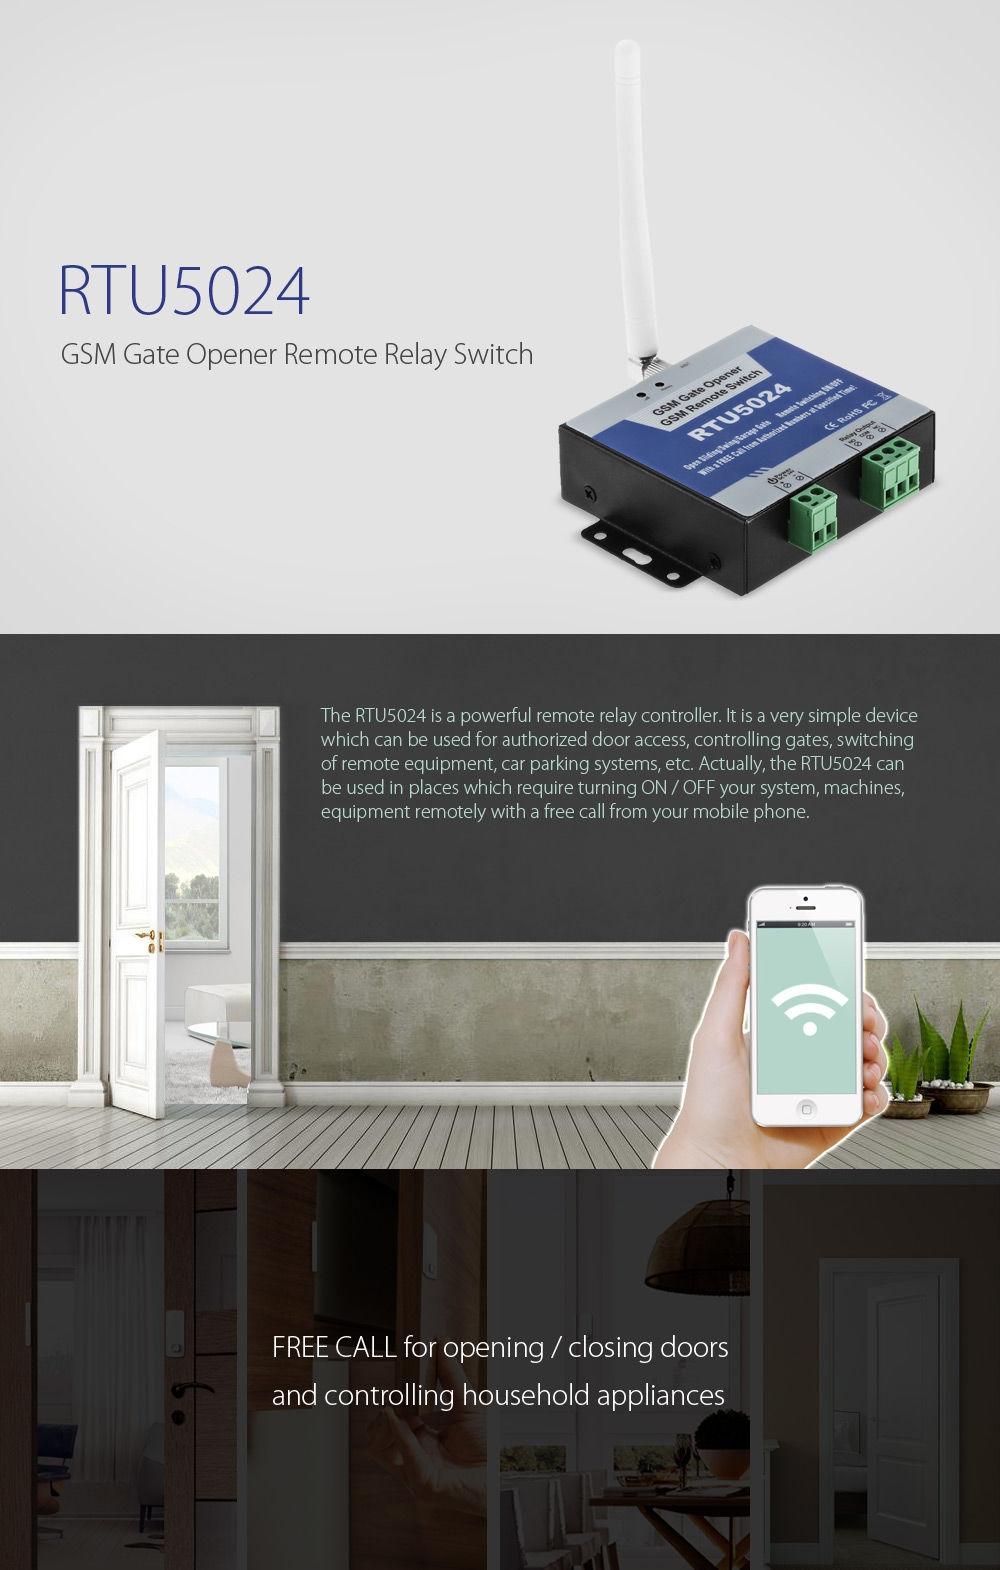 Generic RTU5024 GSM Gate Opener Remote Relay Switch - Blue